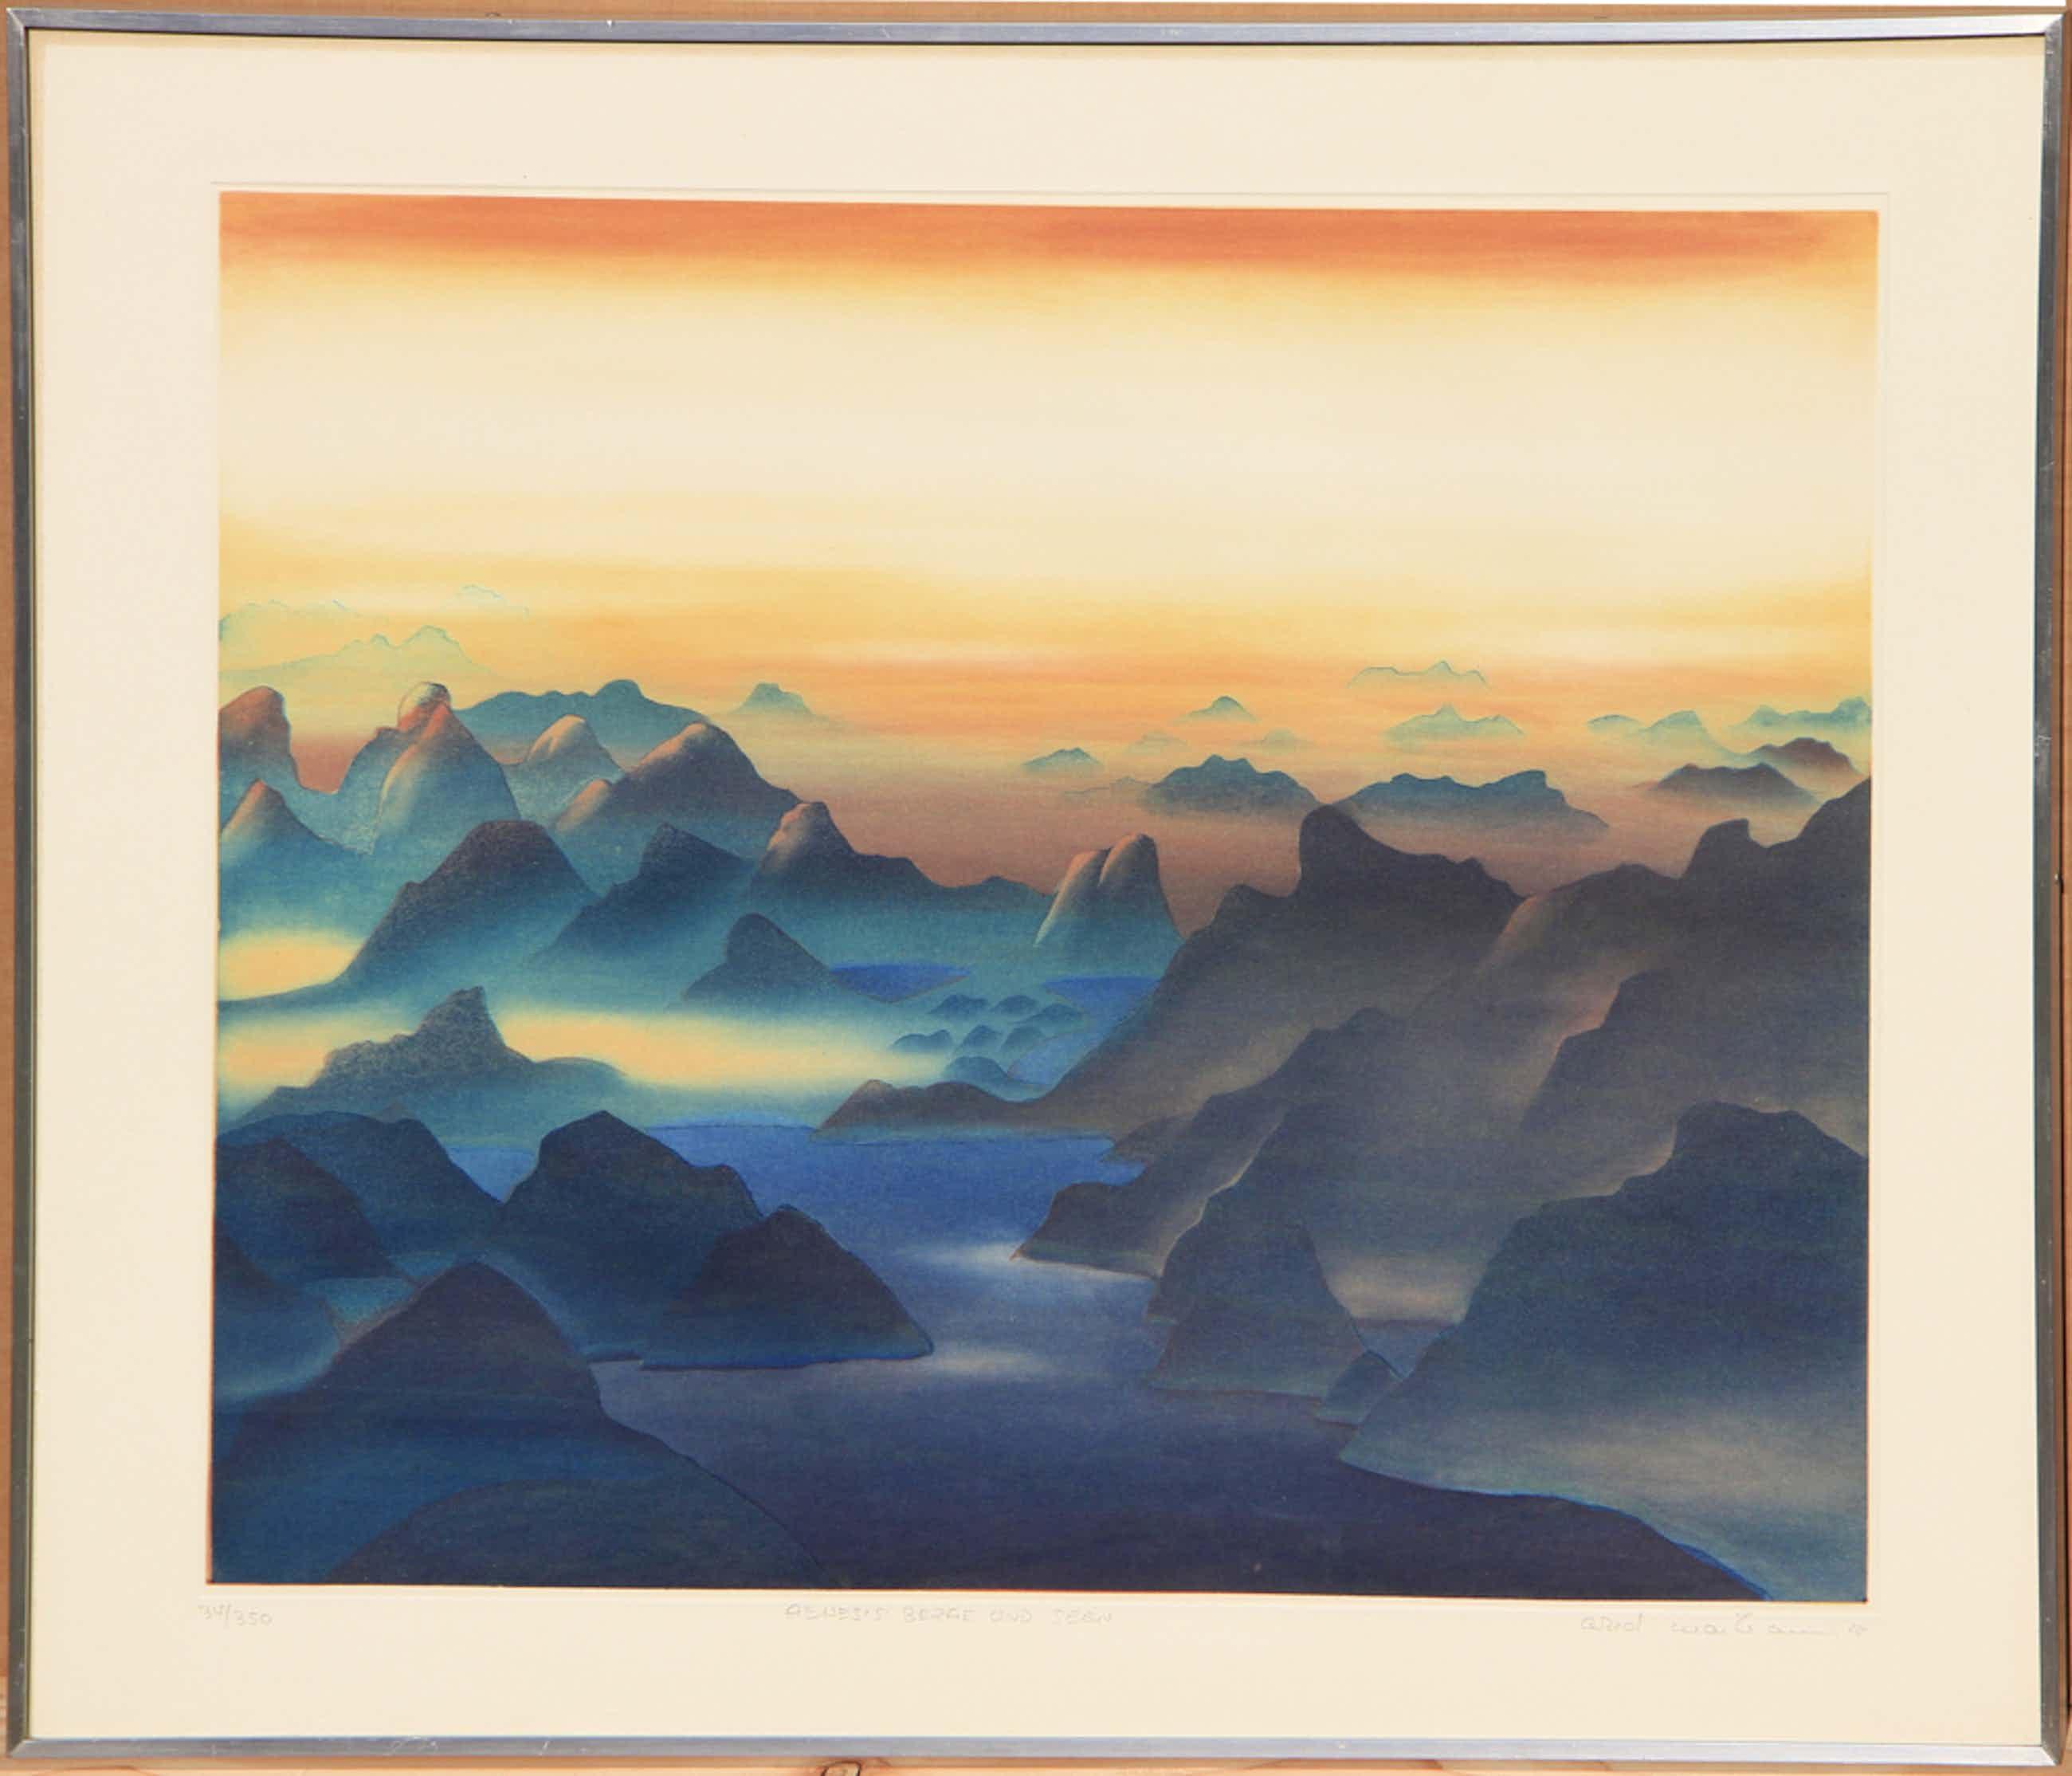 Arnd Maibaum - Genesis Berge und Seen - Orignal-Farbradierung limitiert 34/350 kopen? Bied vanaf 100!